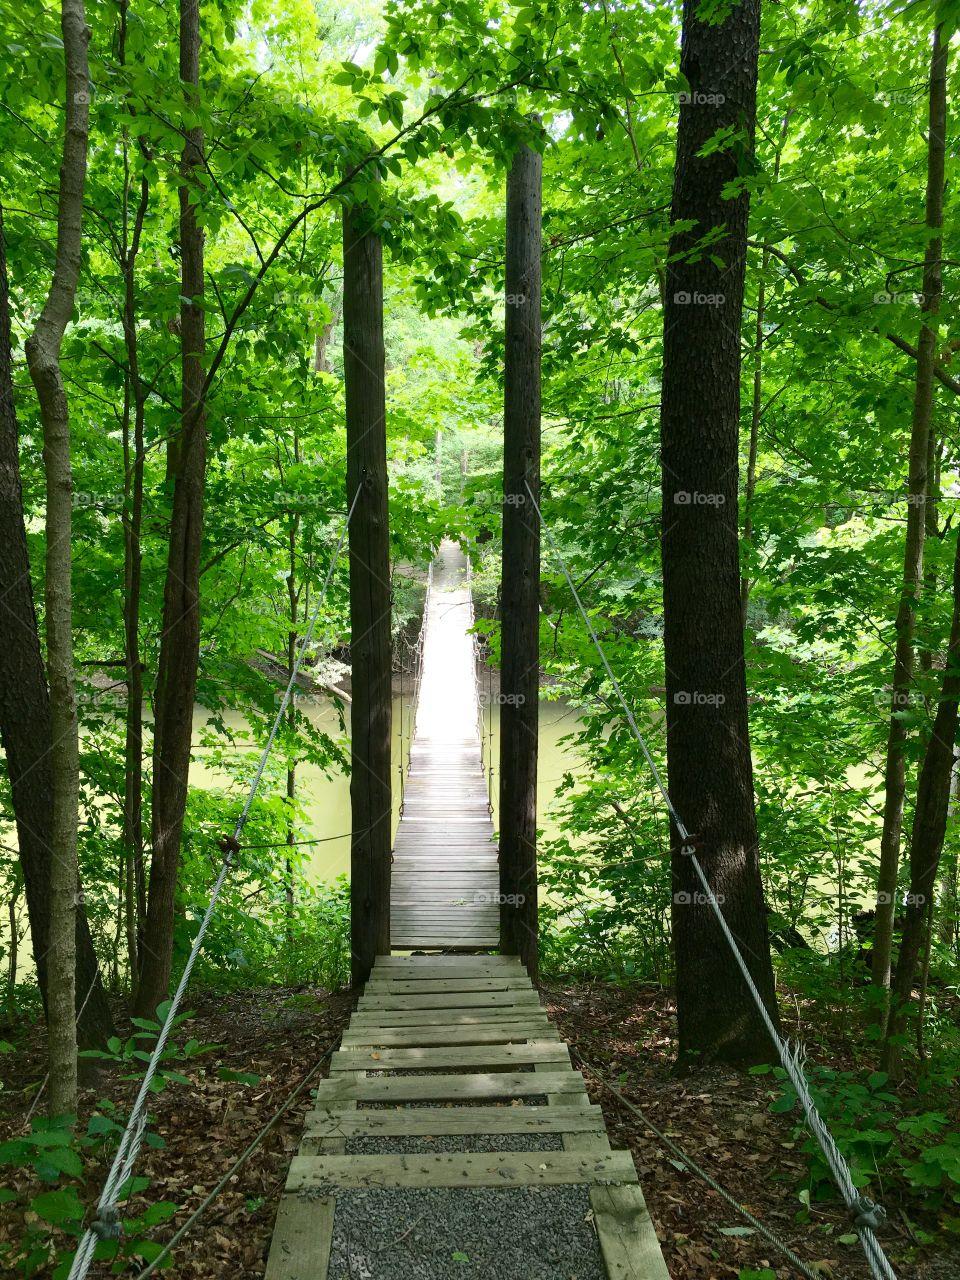 Swinging bridge in Bluffton Ohio